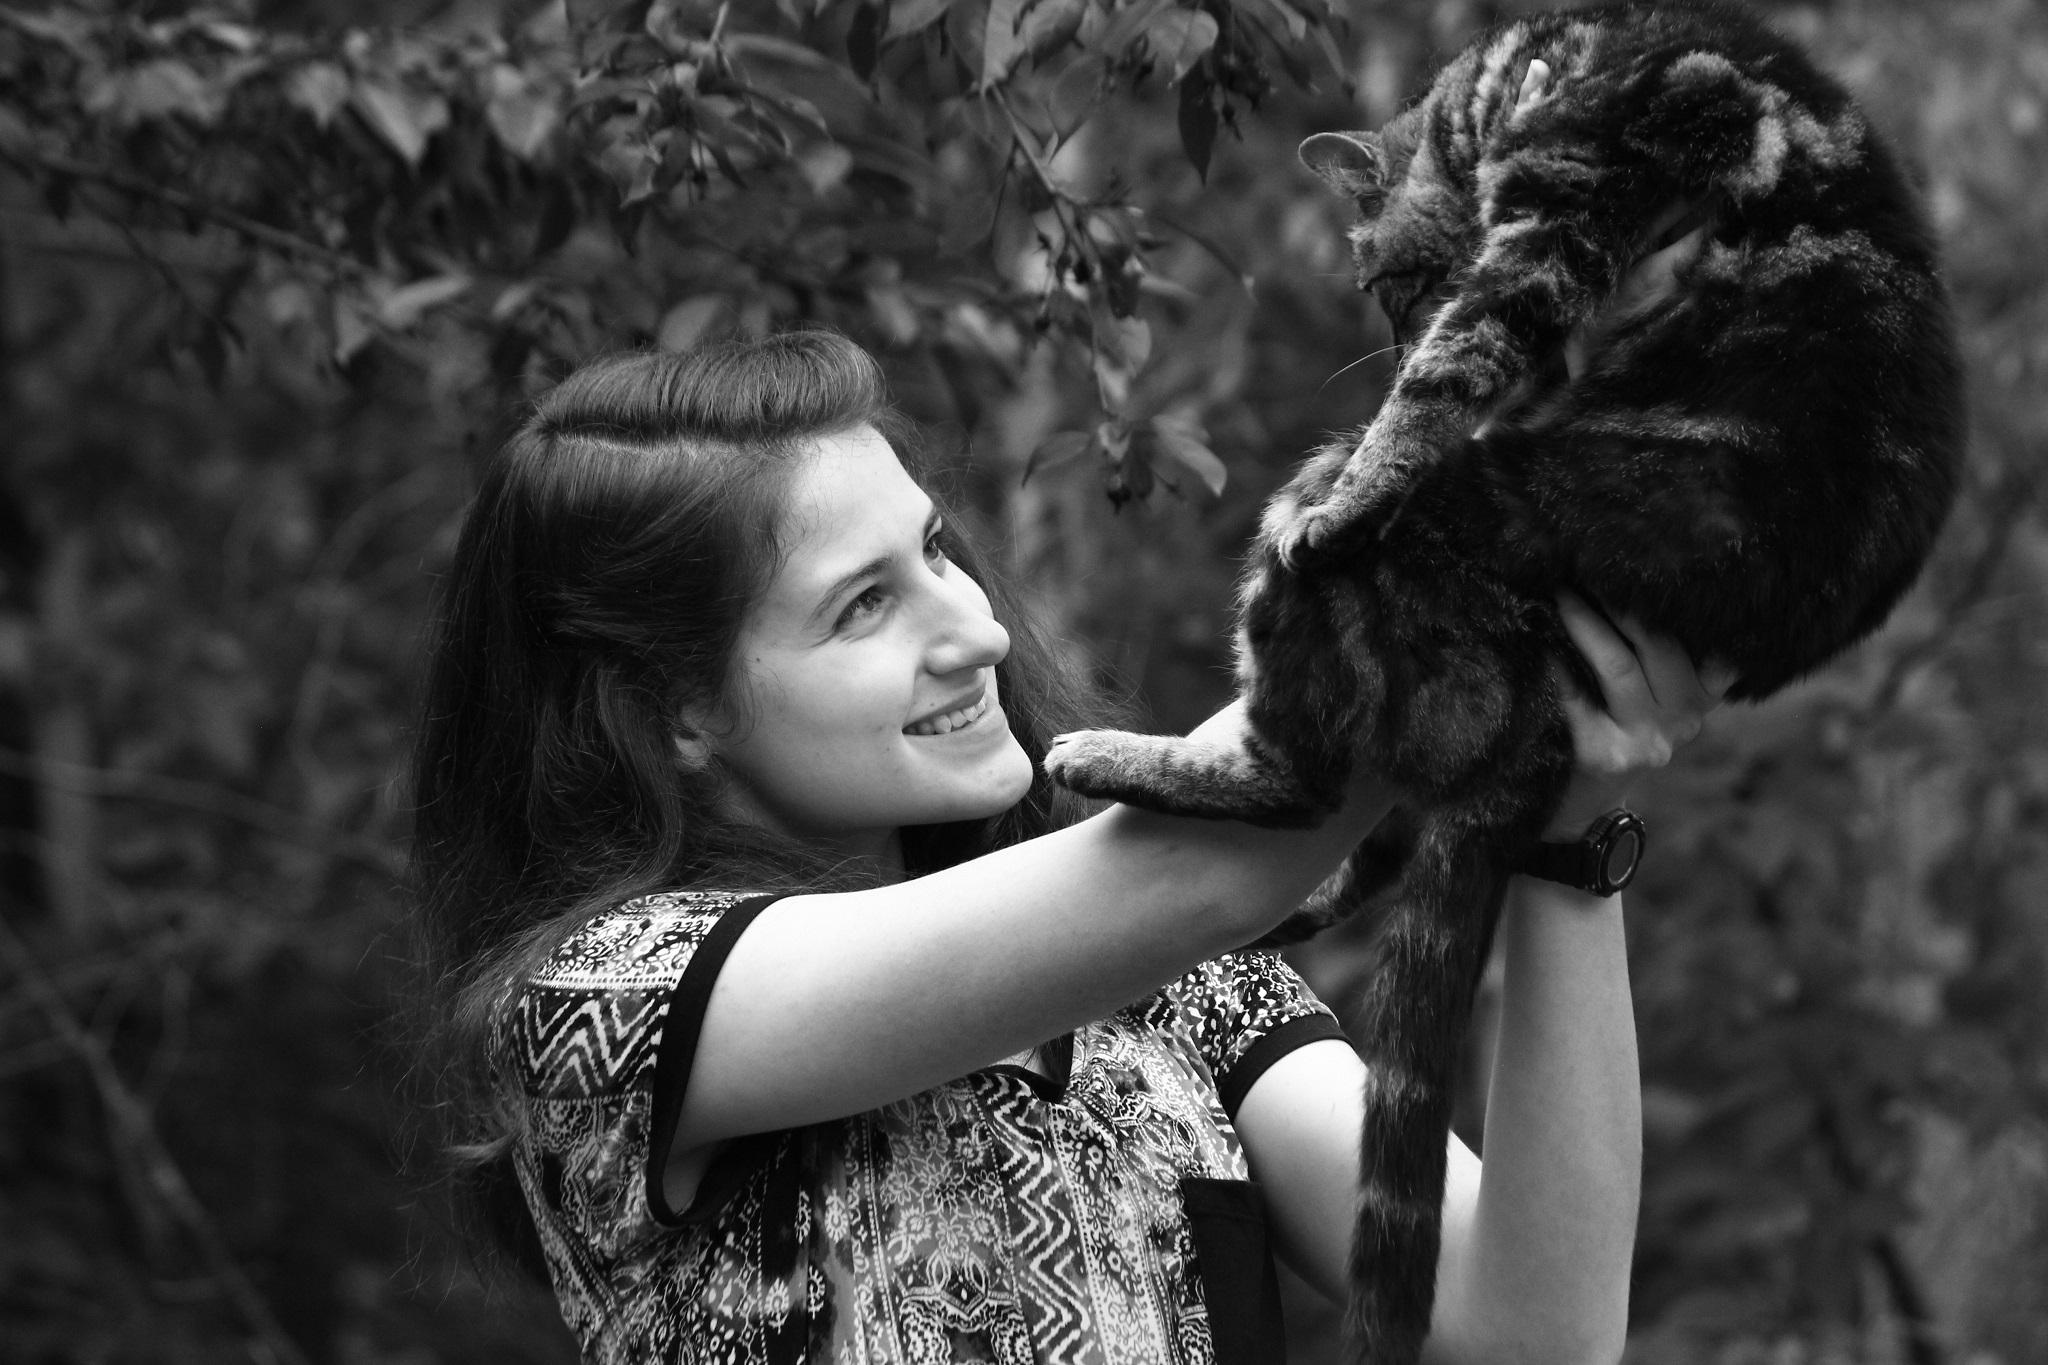 Eileen Crusta, cat behavior expert and web developer